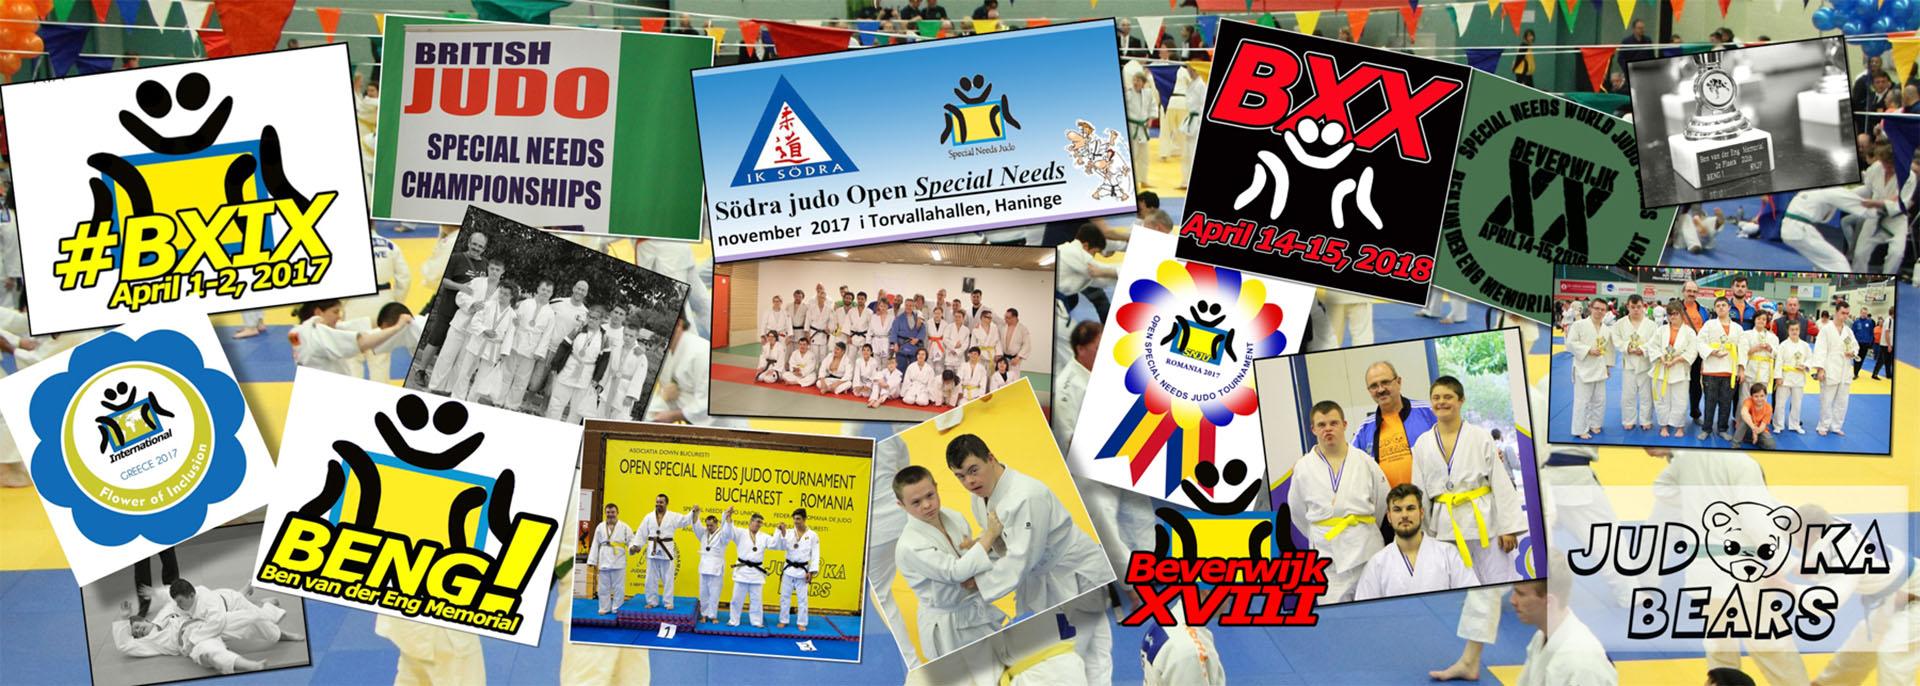 foto ANIMATIE (10) - judo